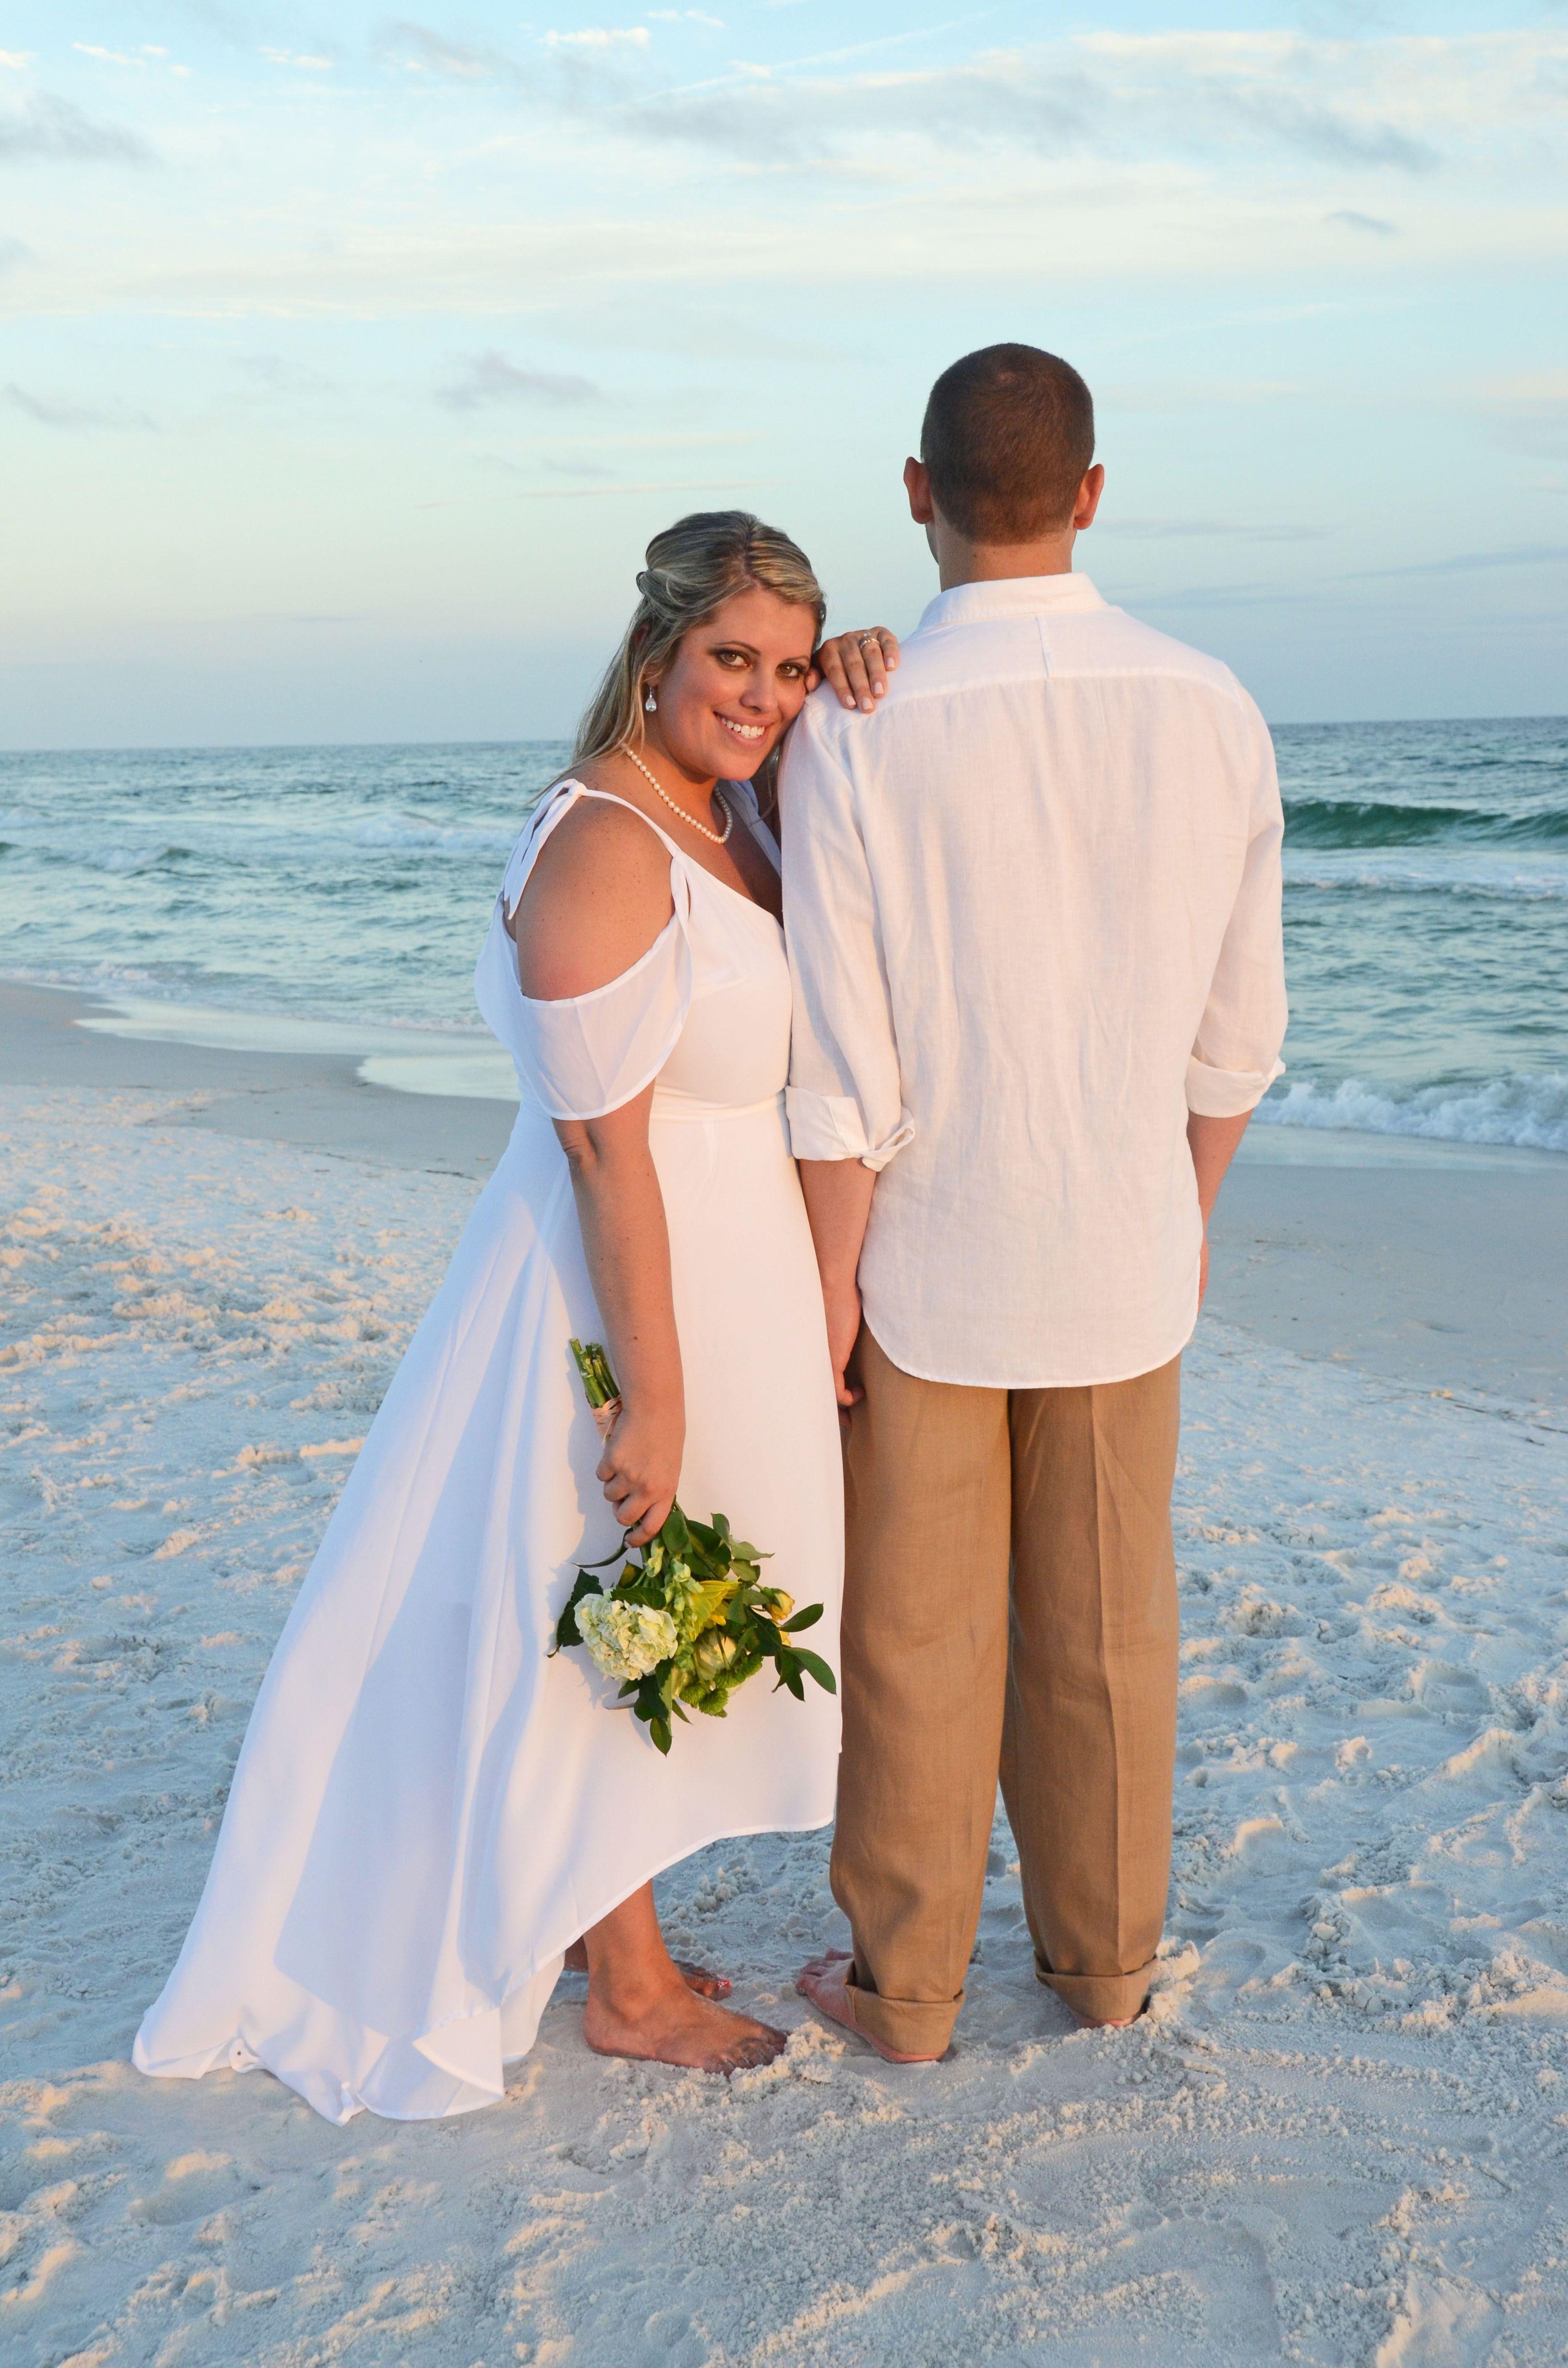 Wedding renewal dresses for beach  Dune Allen Beach Florida destination beach wedding  Beach Brides